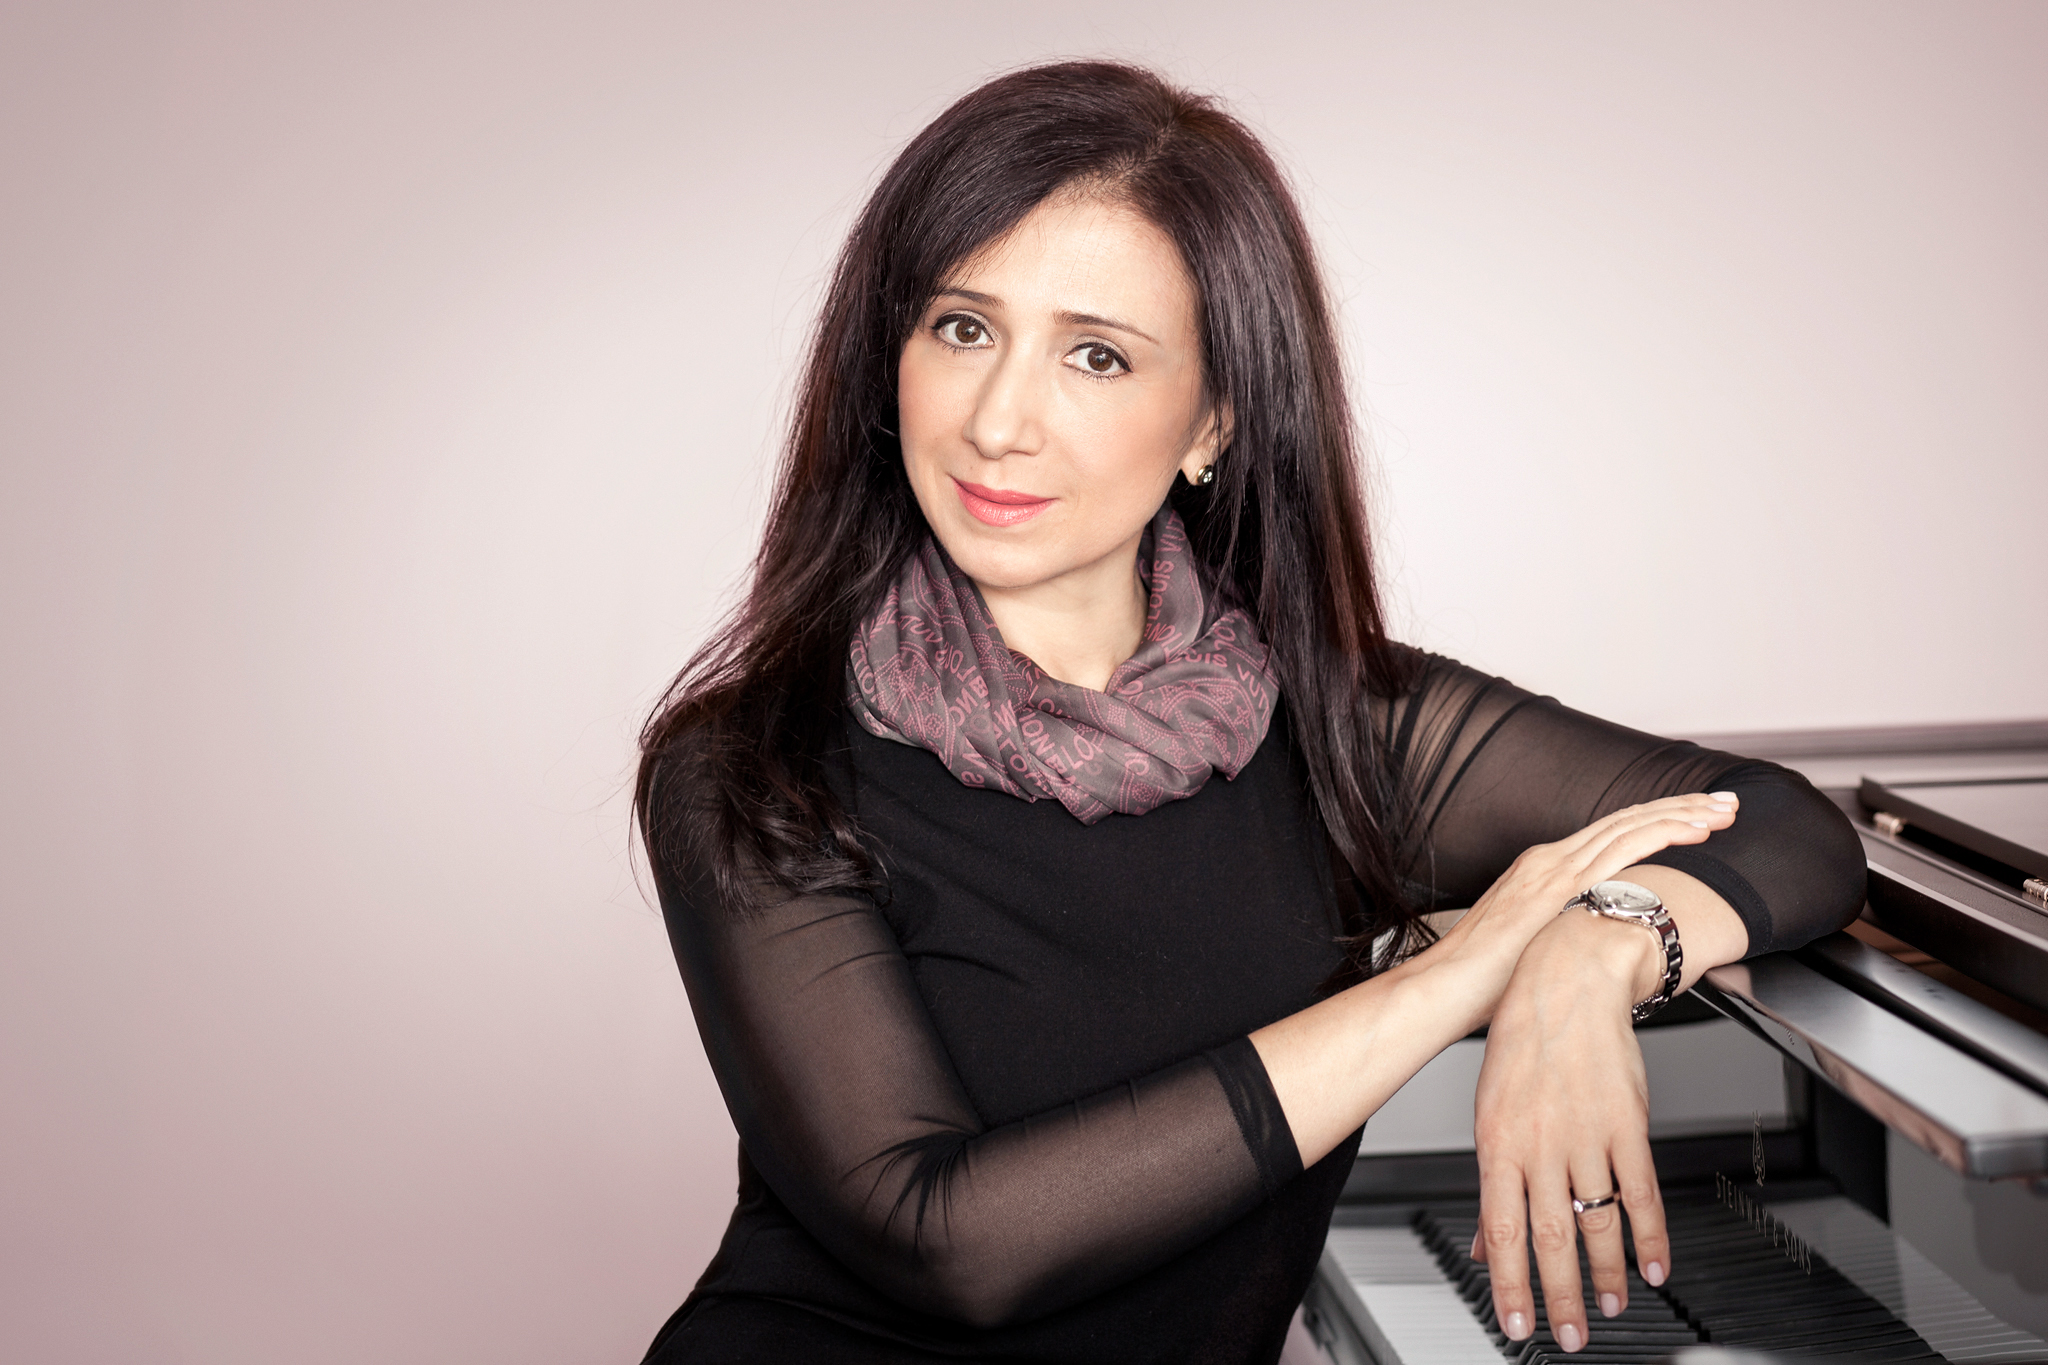 Marina Kheifets